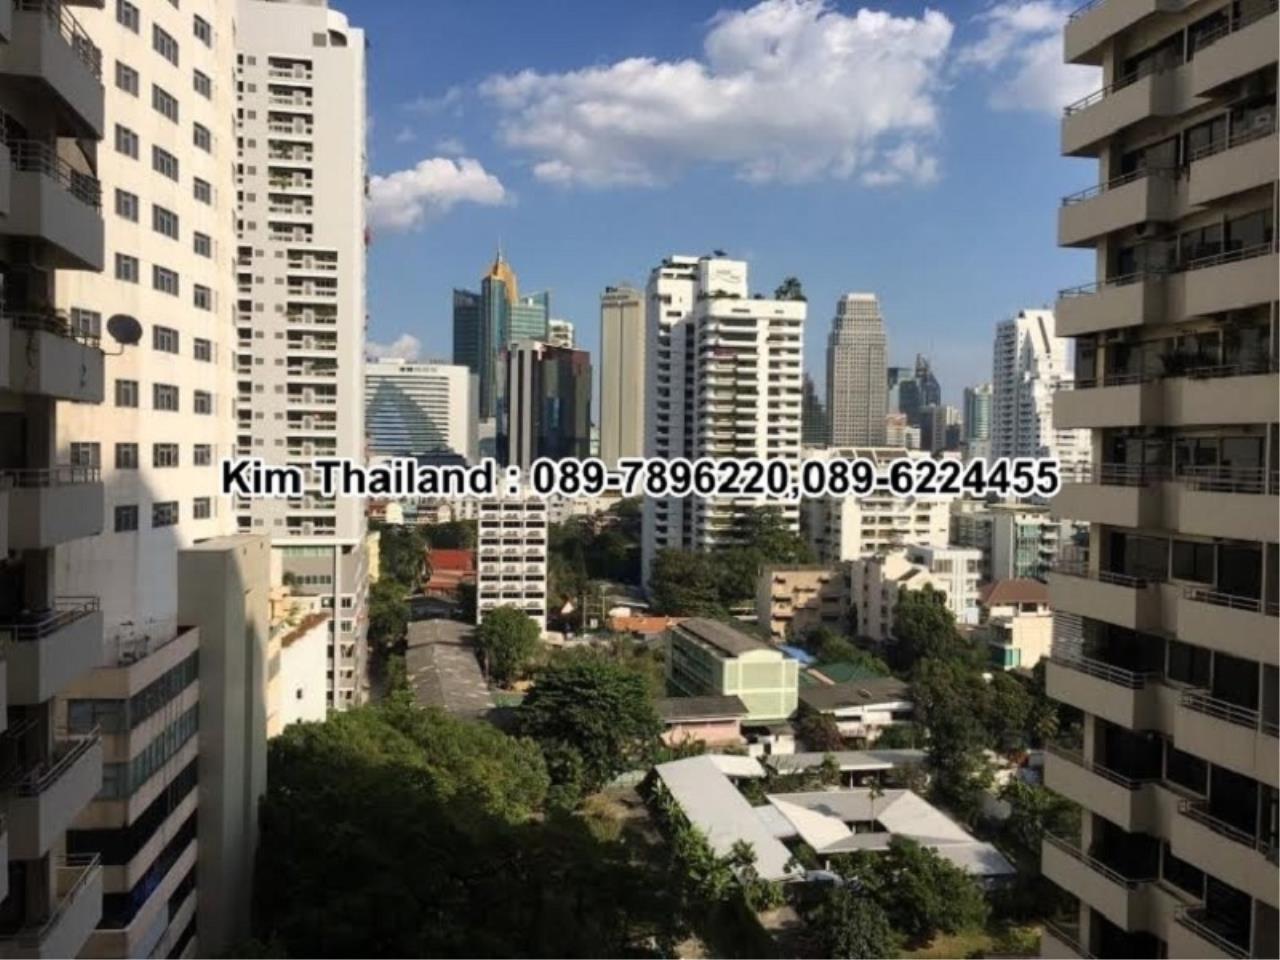 BKKcondorental Agency's For rent, Condo Saranjai Mansion. Area 35 sq.m. Studio. Rent 16,000baht/month 8